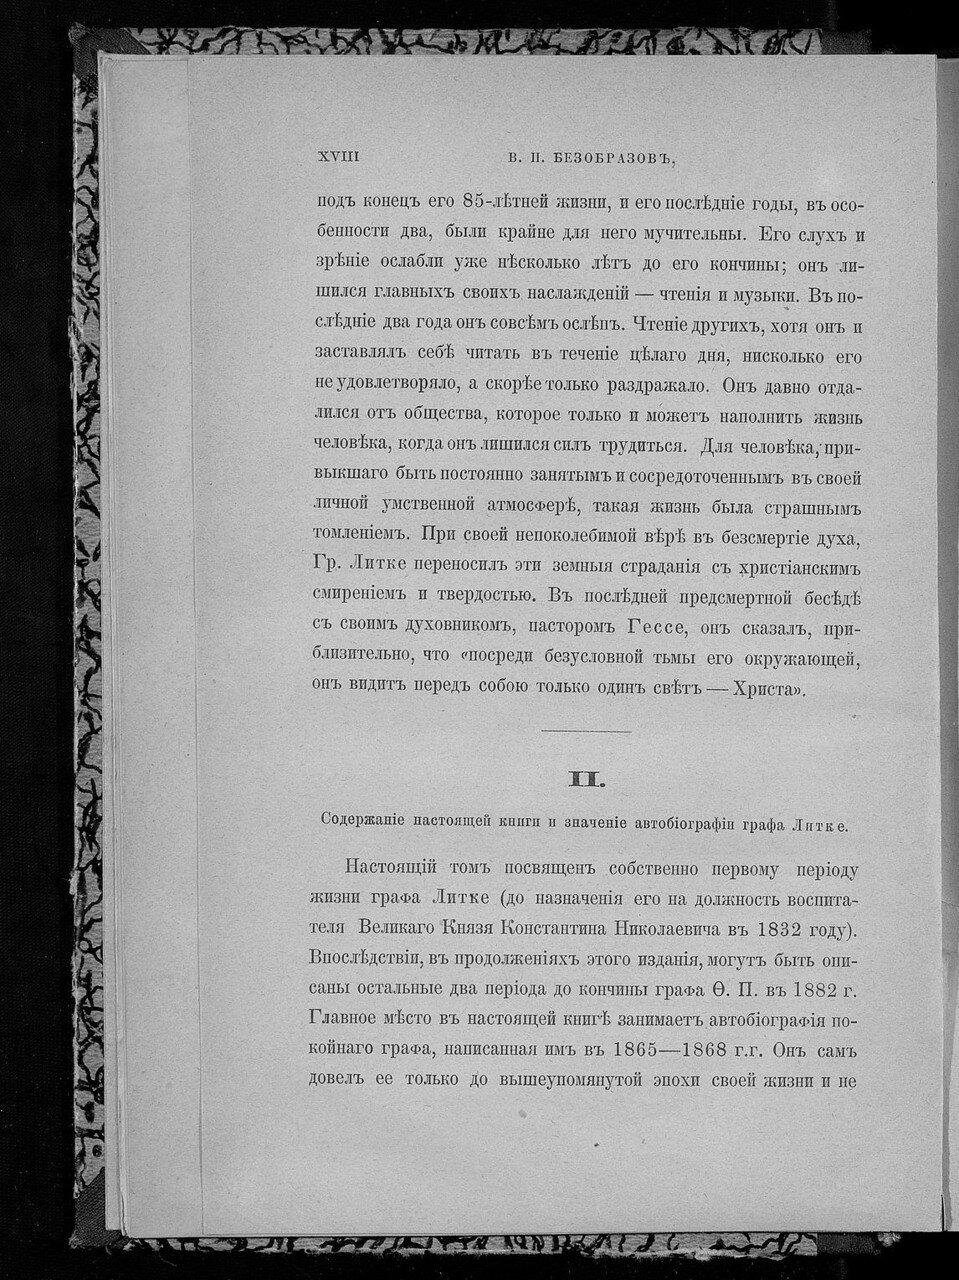 https://img-fotki.yandex.ru/get/770851/199368979.d2/0_21dd64_12ce50b9_XXXL.jpg